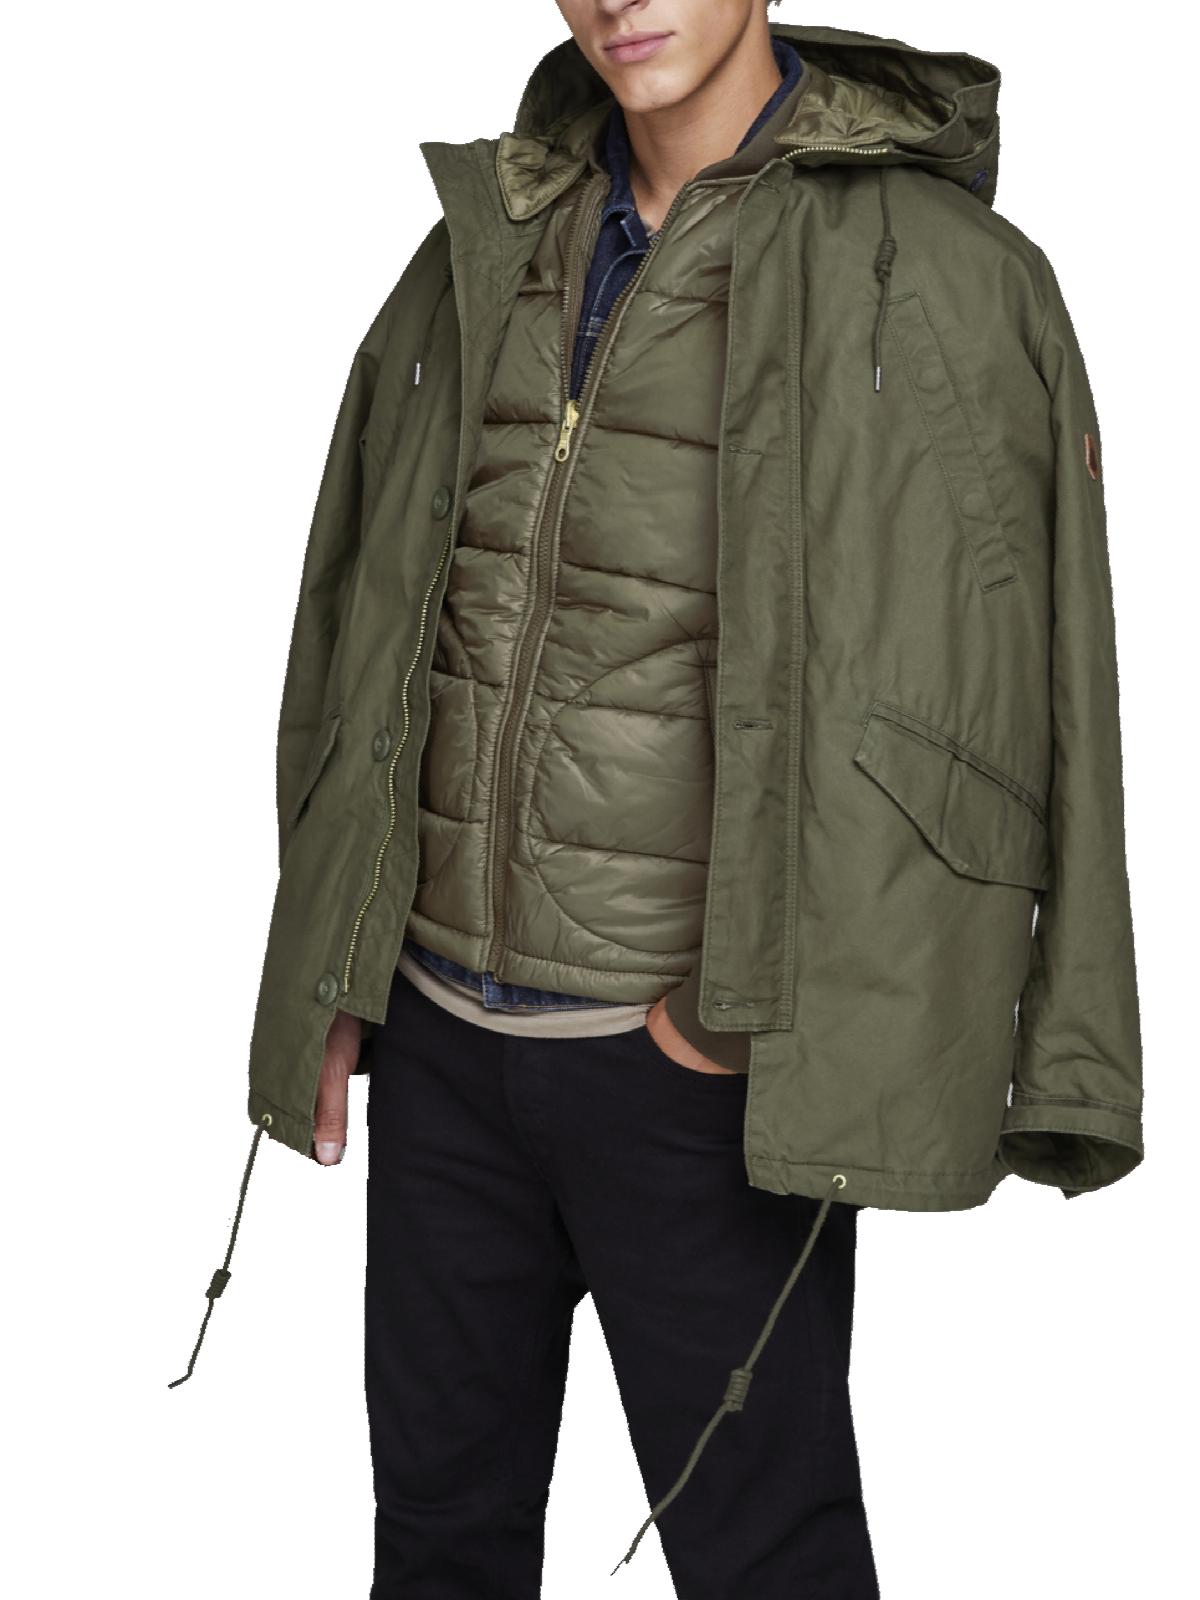 jack jones herren parka jacke mantel zwei in eins kapuze. Black Bedroom Furniture Sets. Home Design Ideas